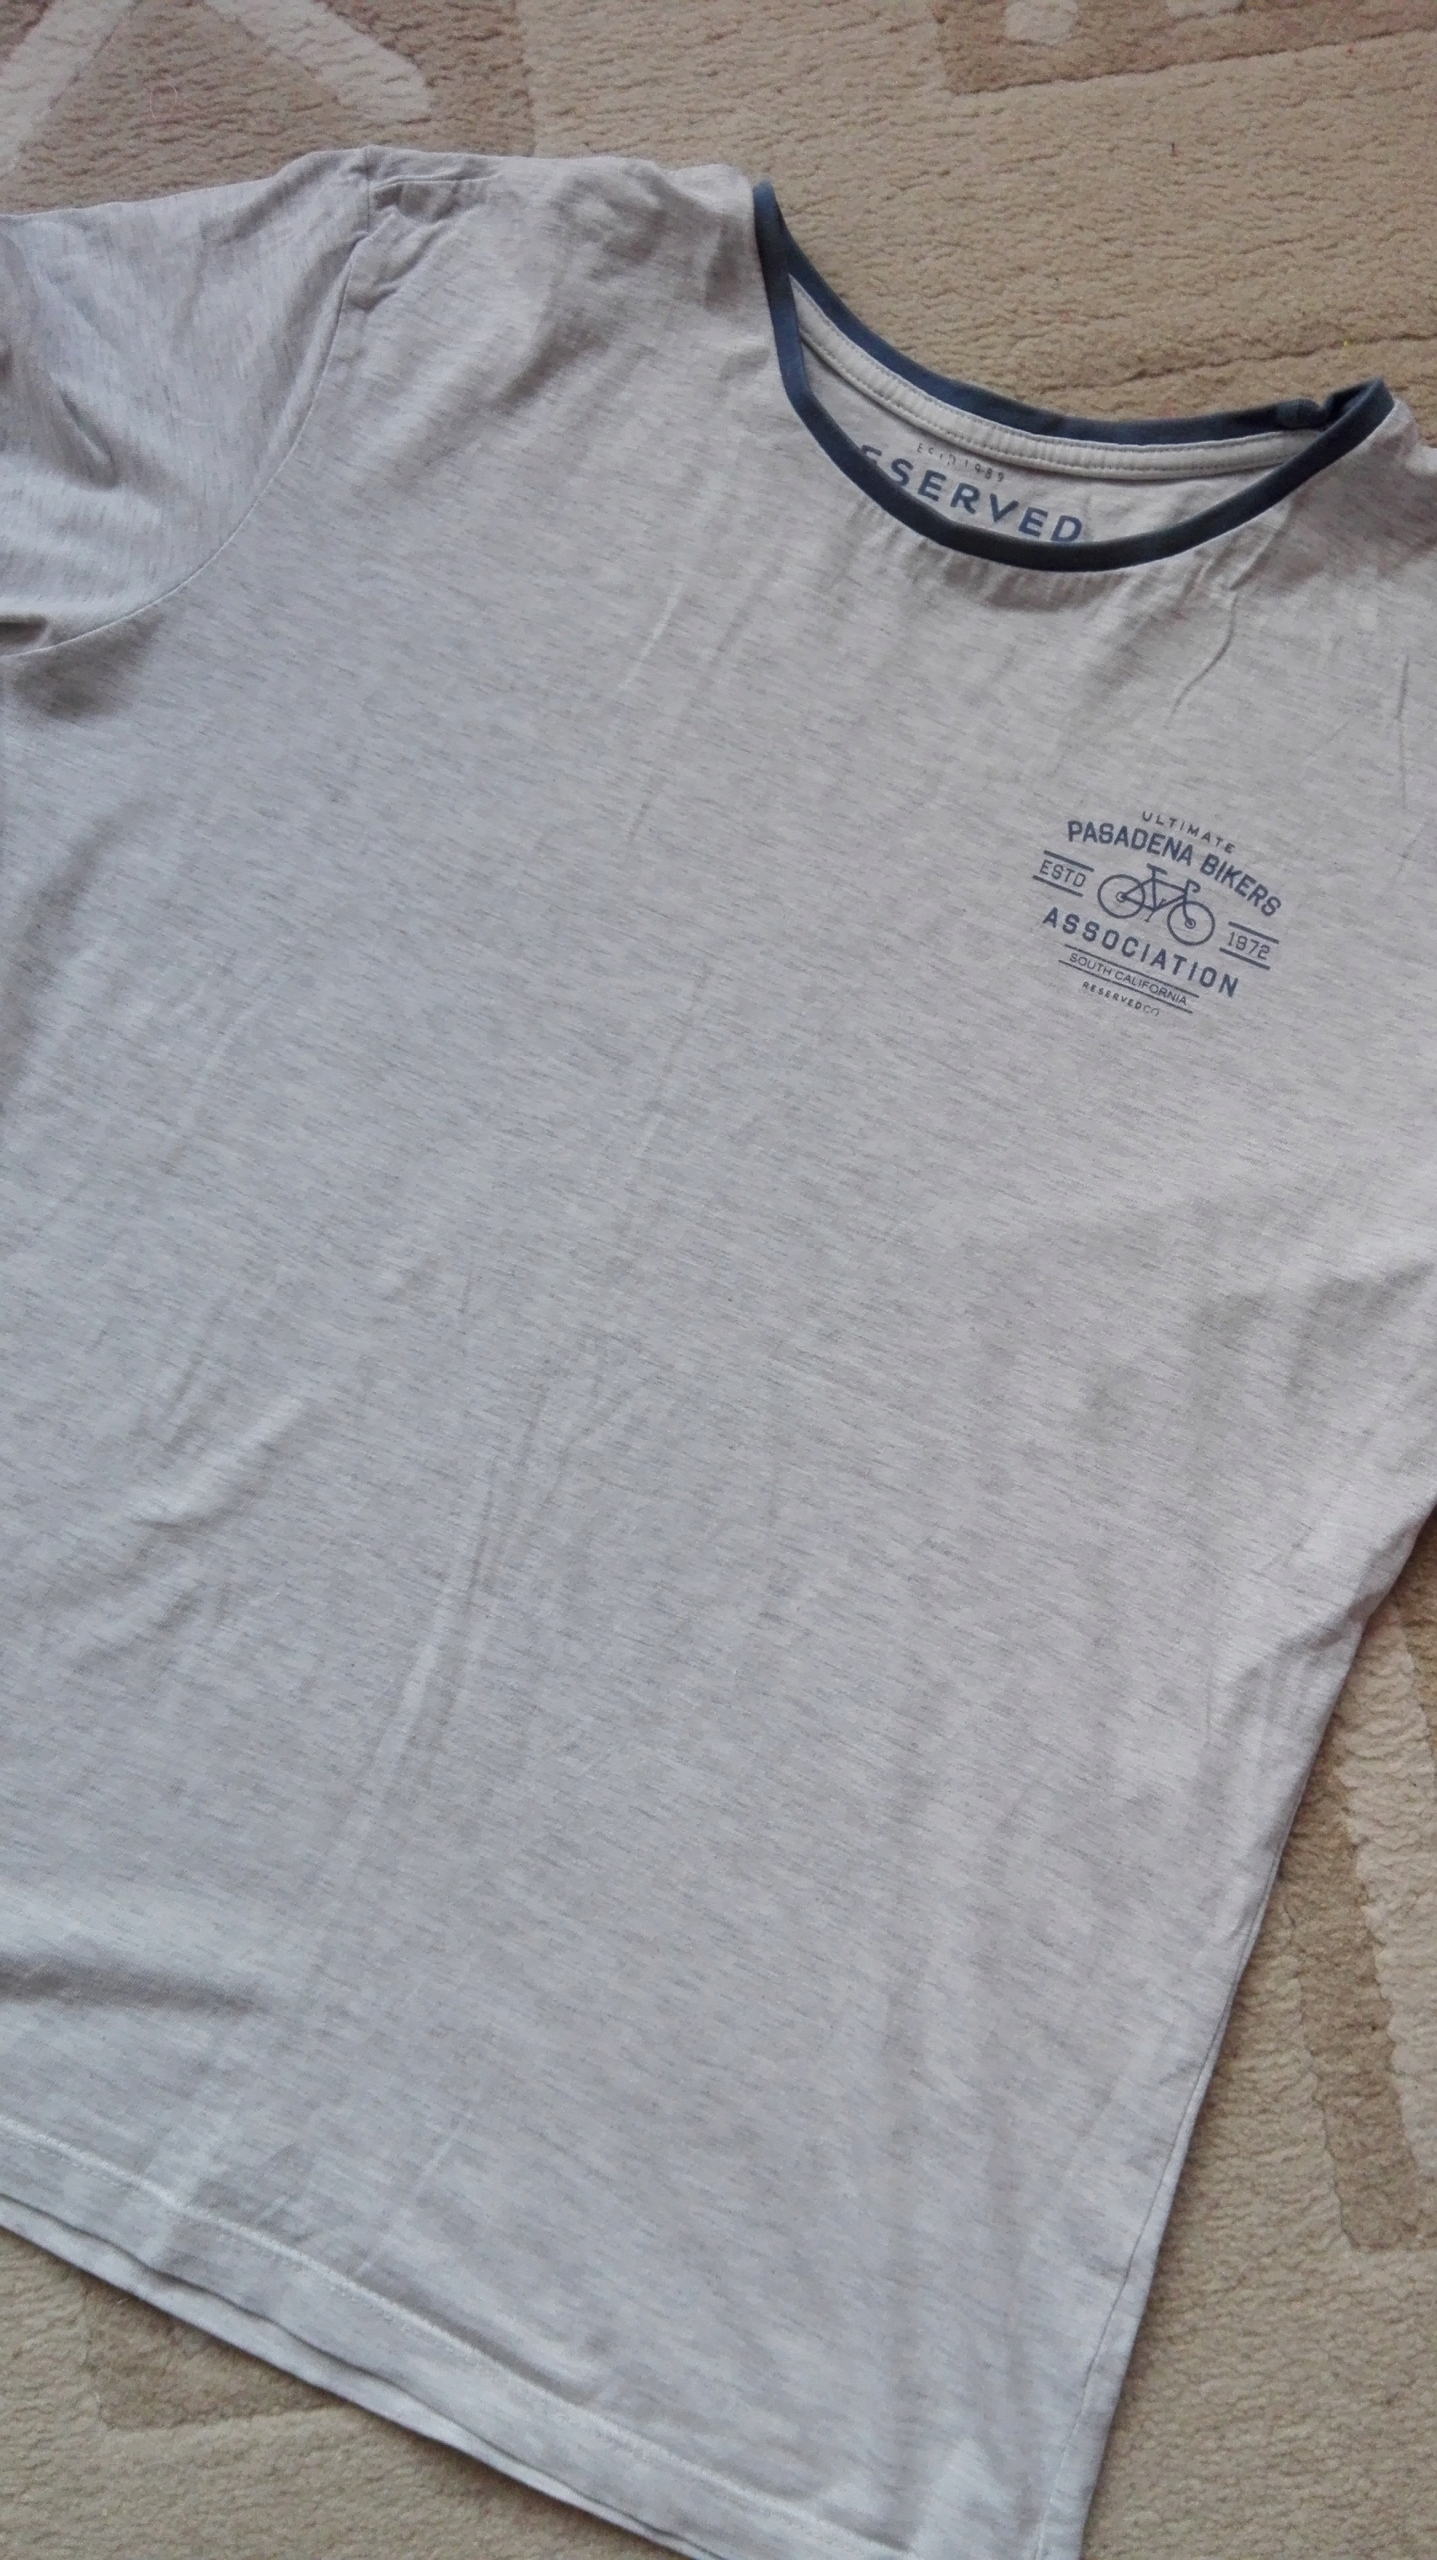 RESERVED T-SHIRT męski S print gratis